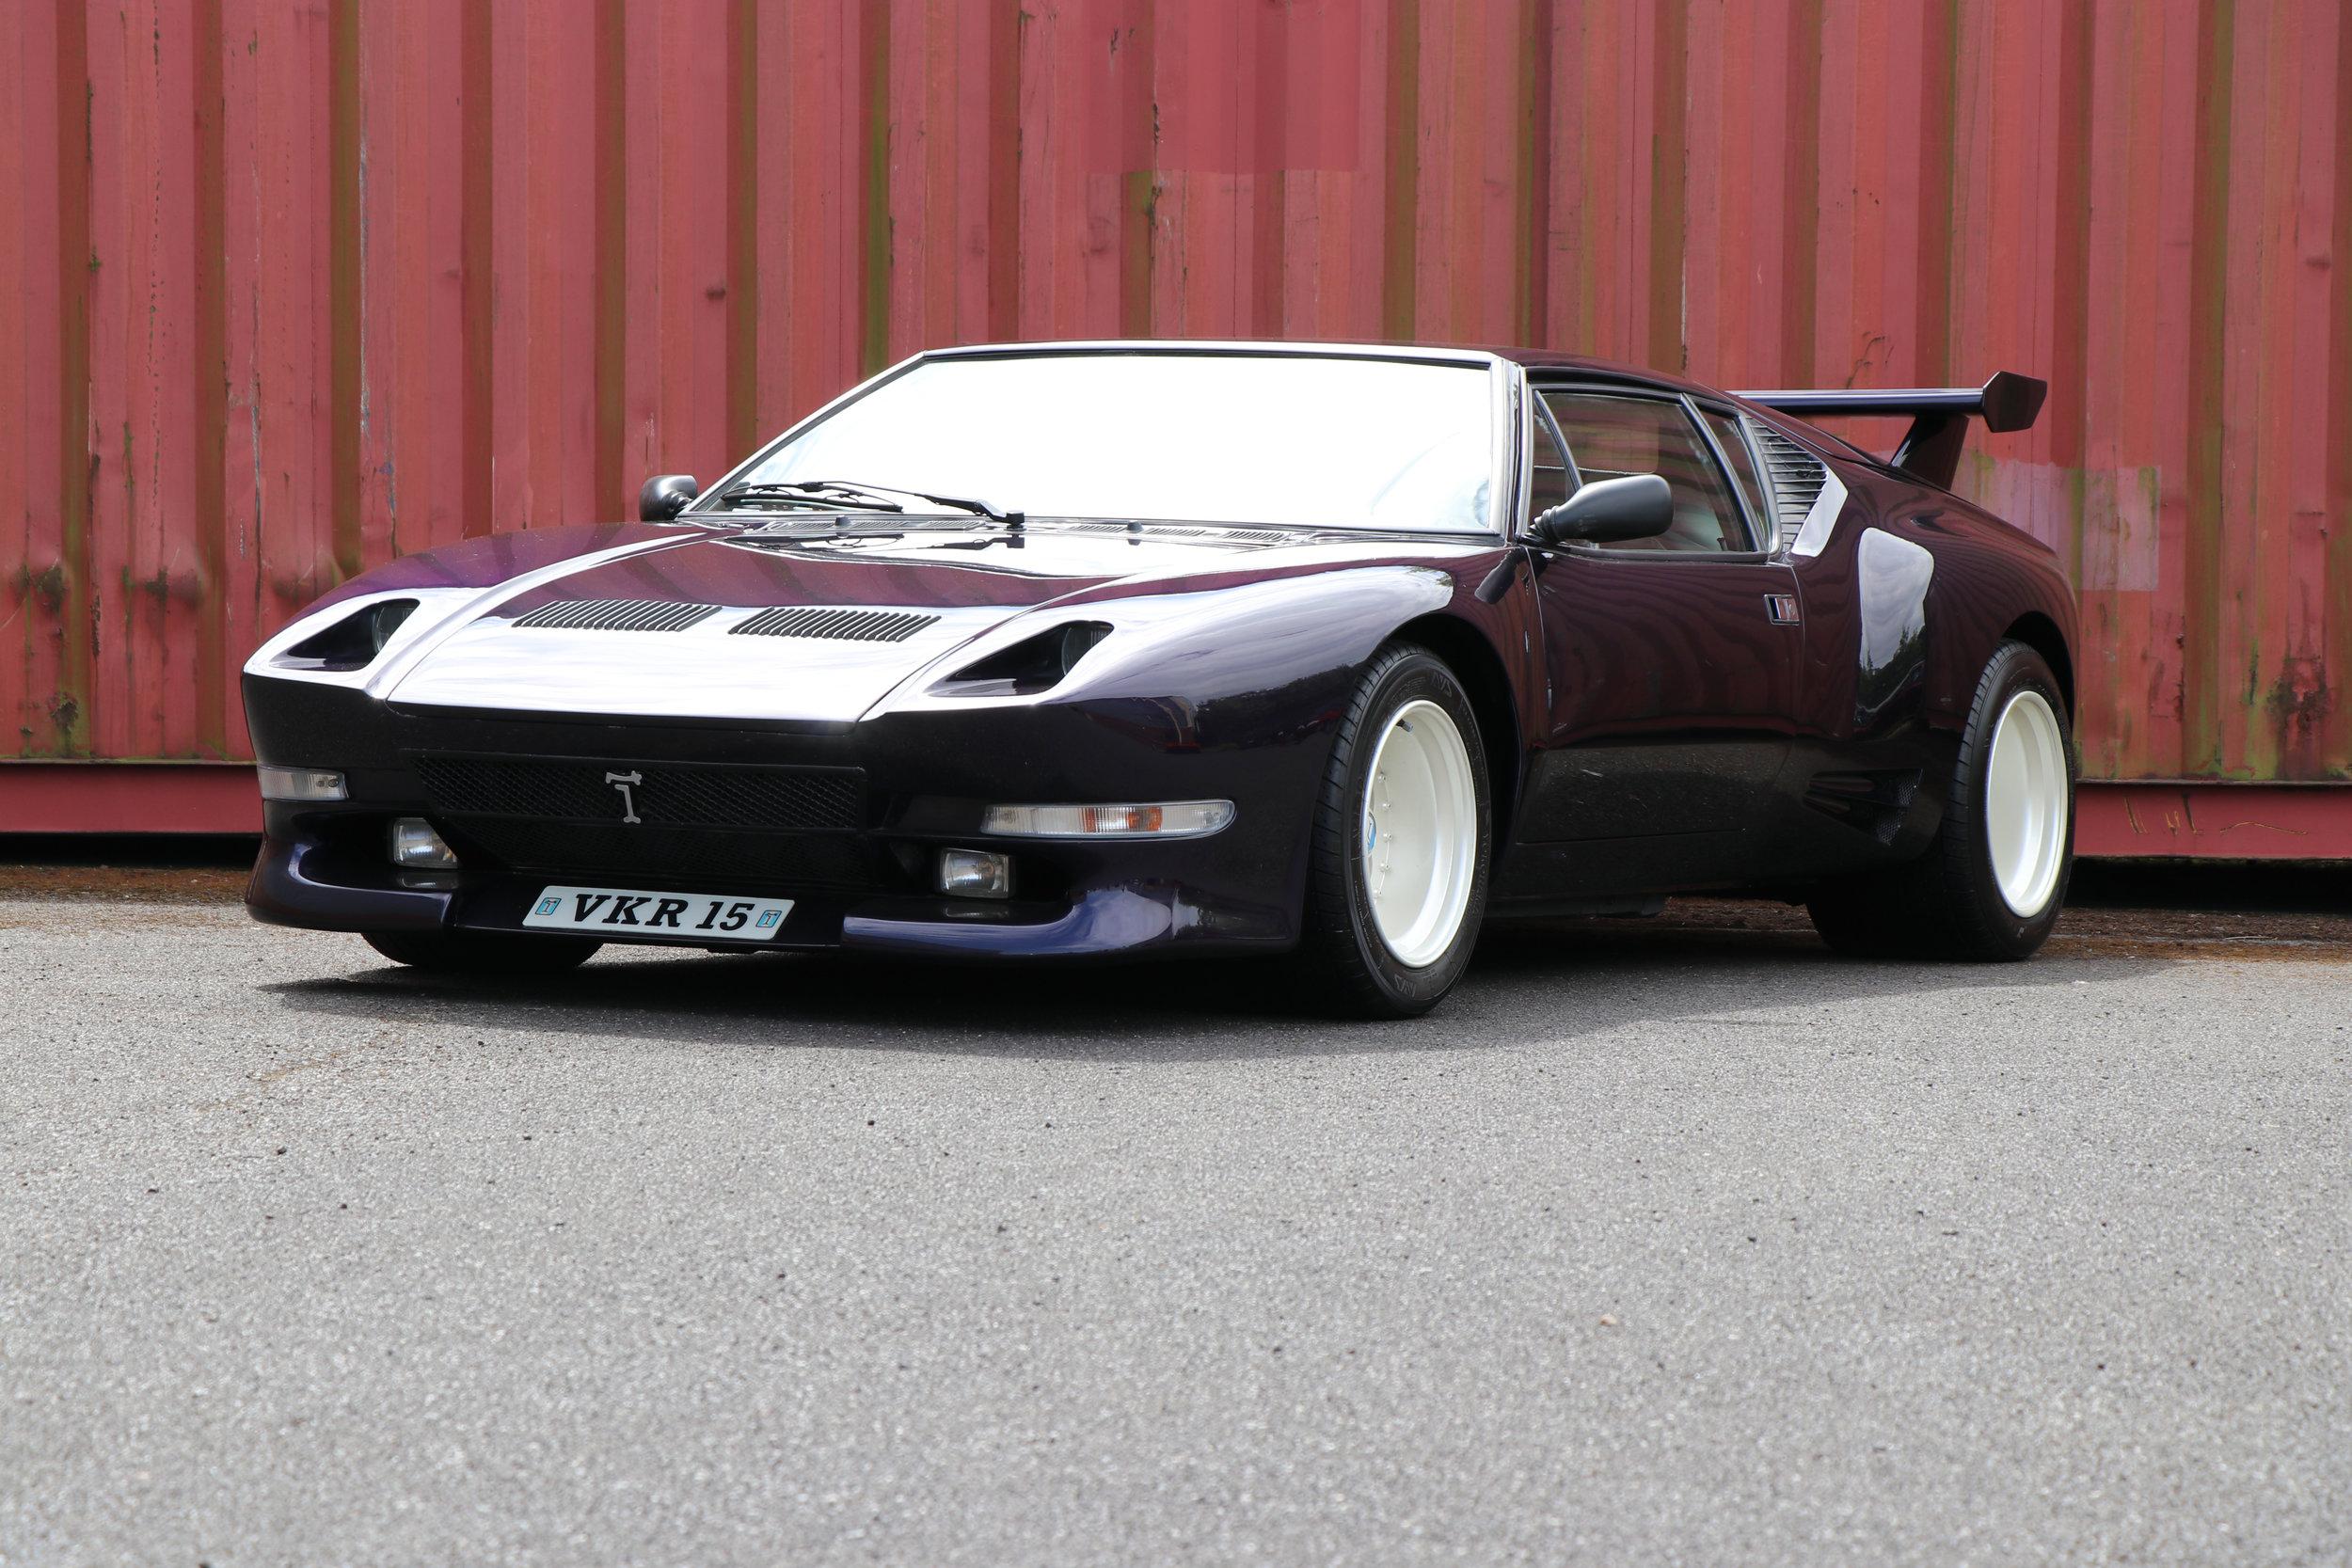 SOLD De Tomaso Pantera GTS 1981 restored at Three Point Four